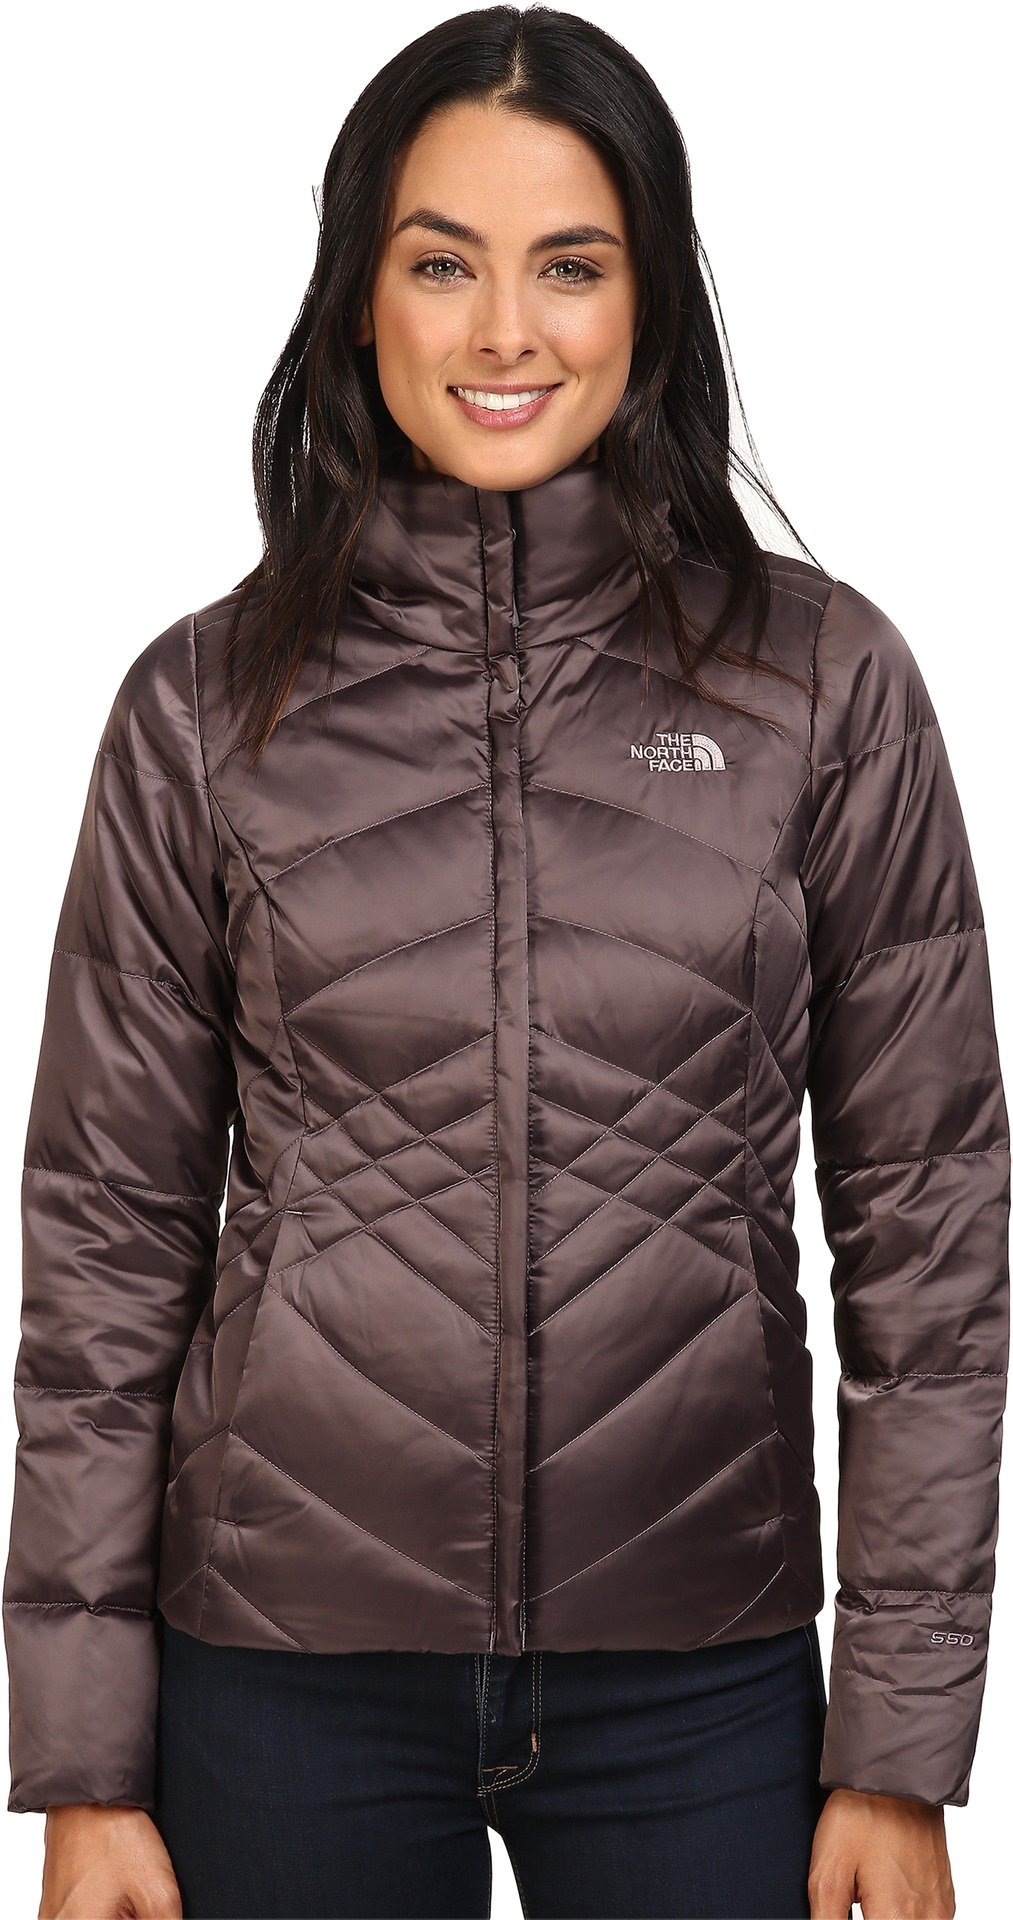 The North Face Women's Aconcagua Jacket, Rabbit Grey, M